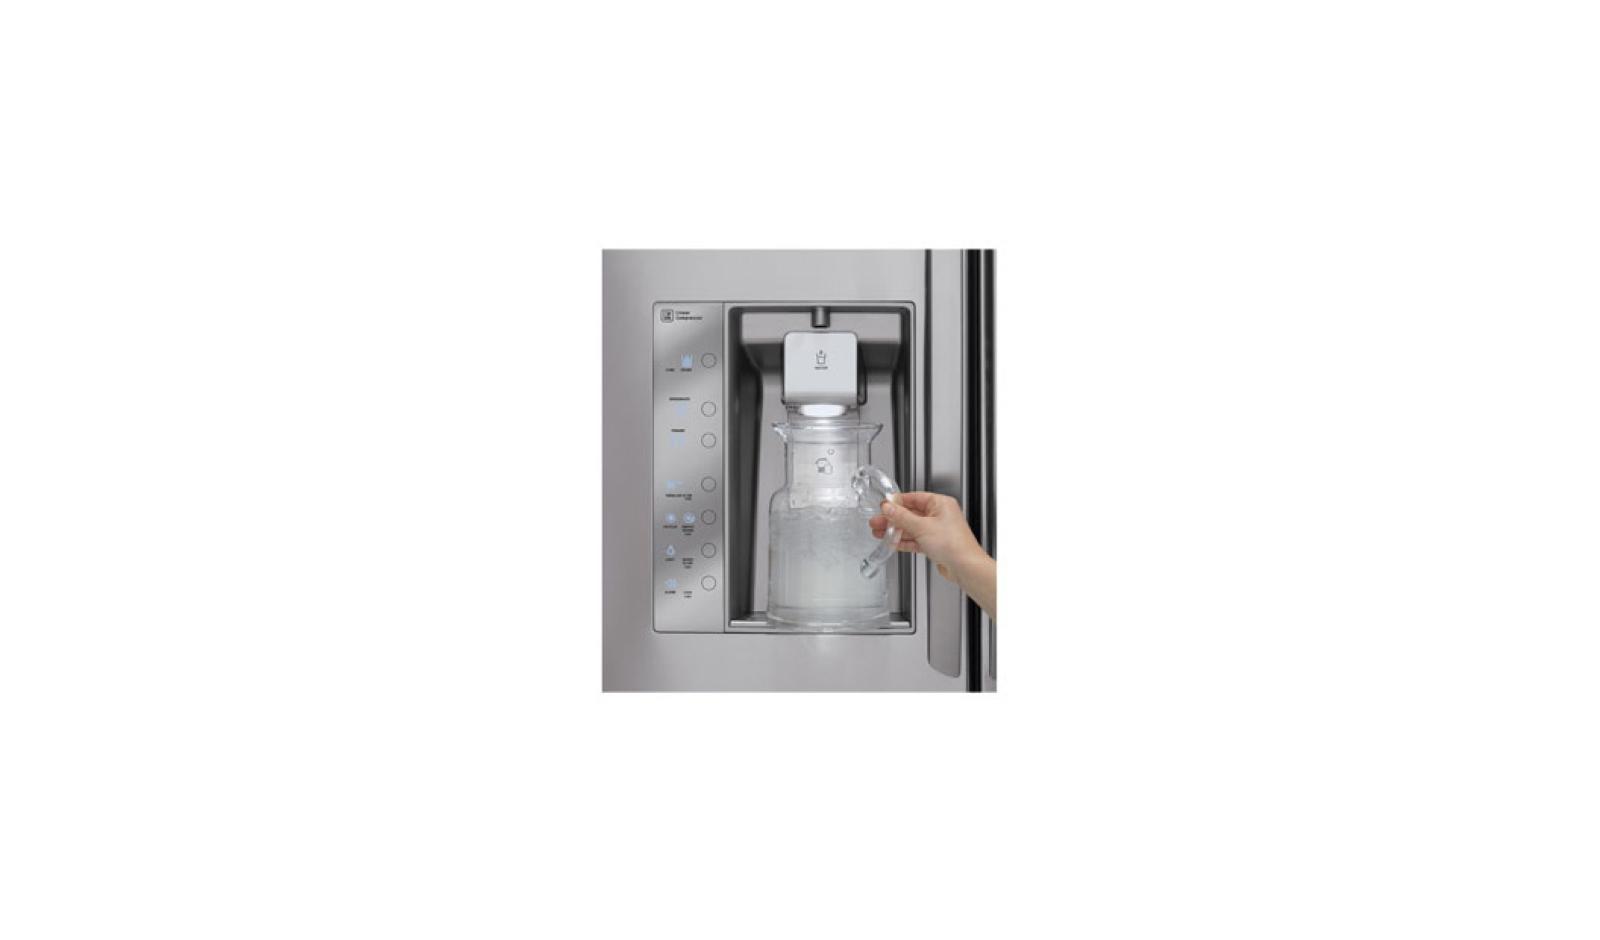 LG LFX31945ST: 3-Door Door-In-Door Refrigerator | LG USA on refrigeror ice water filter, kenmore ice and water filter, kitchenaid fridge filter replacement, whirlpool ice and water filter,